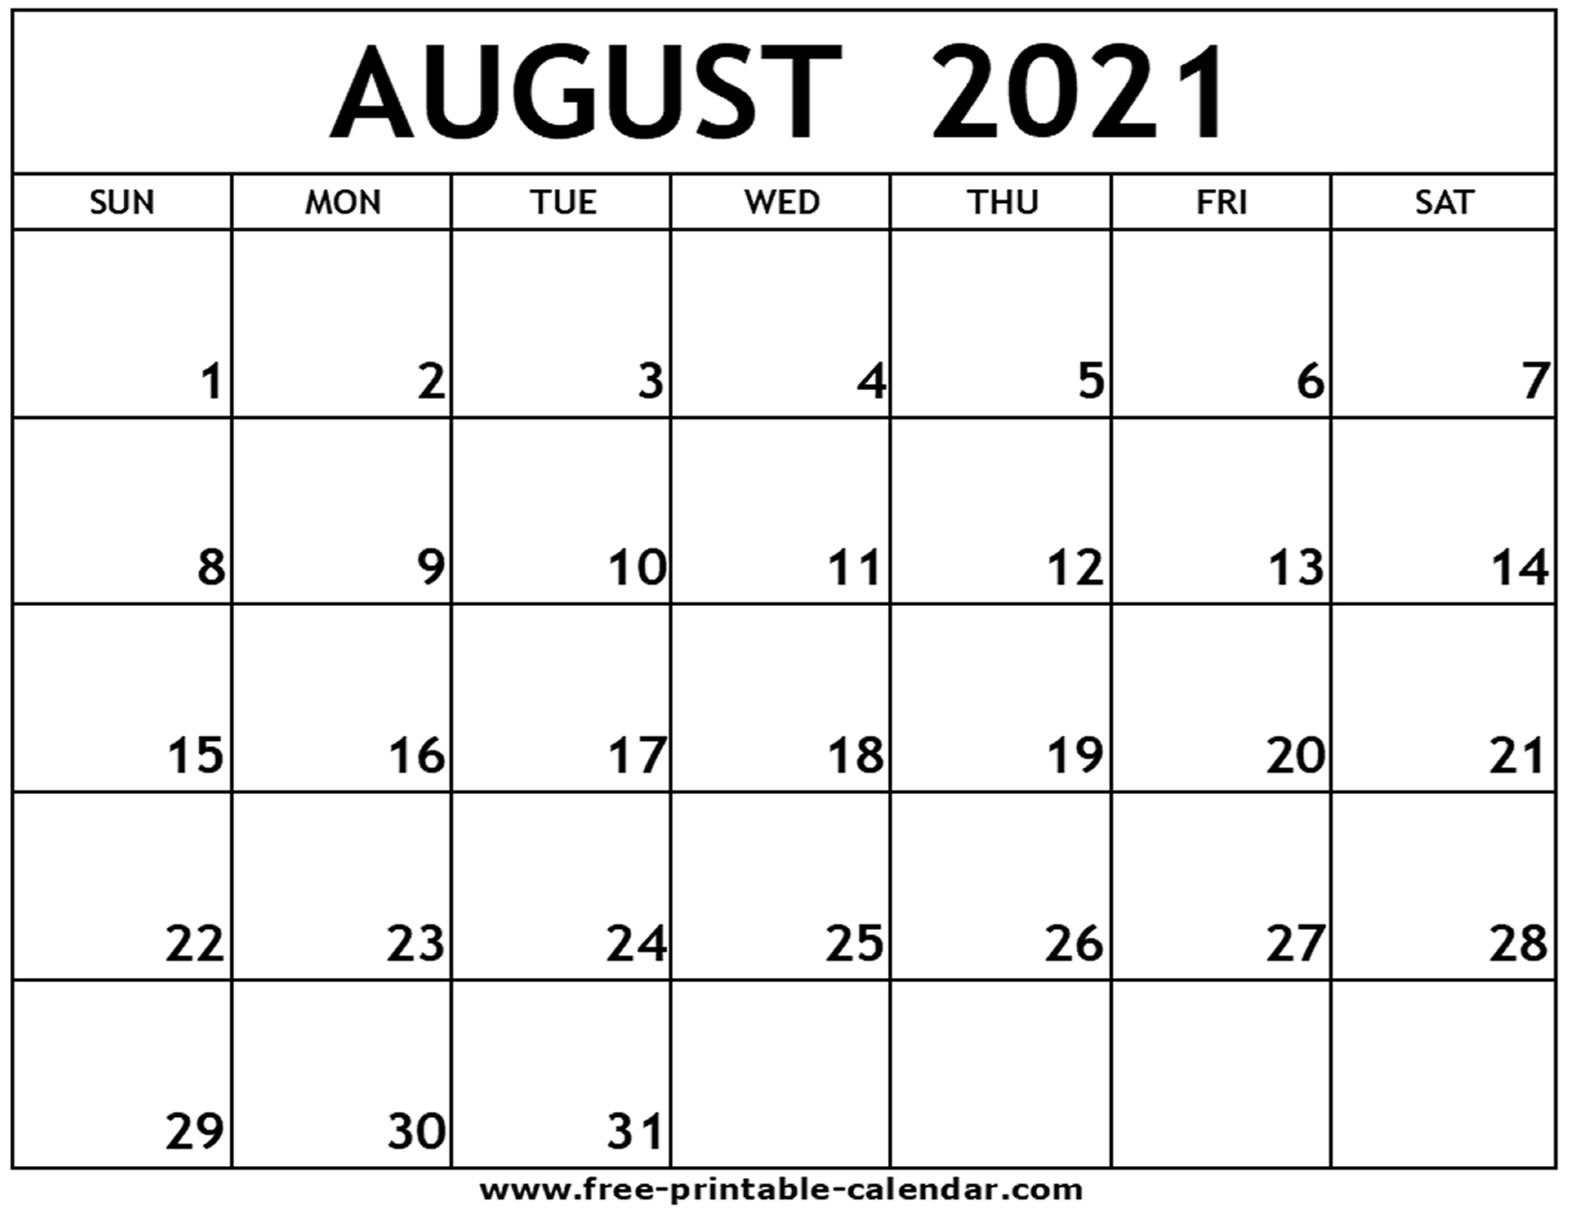 Collect August 2021 Printable Calendar